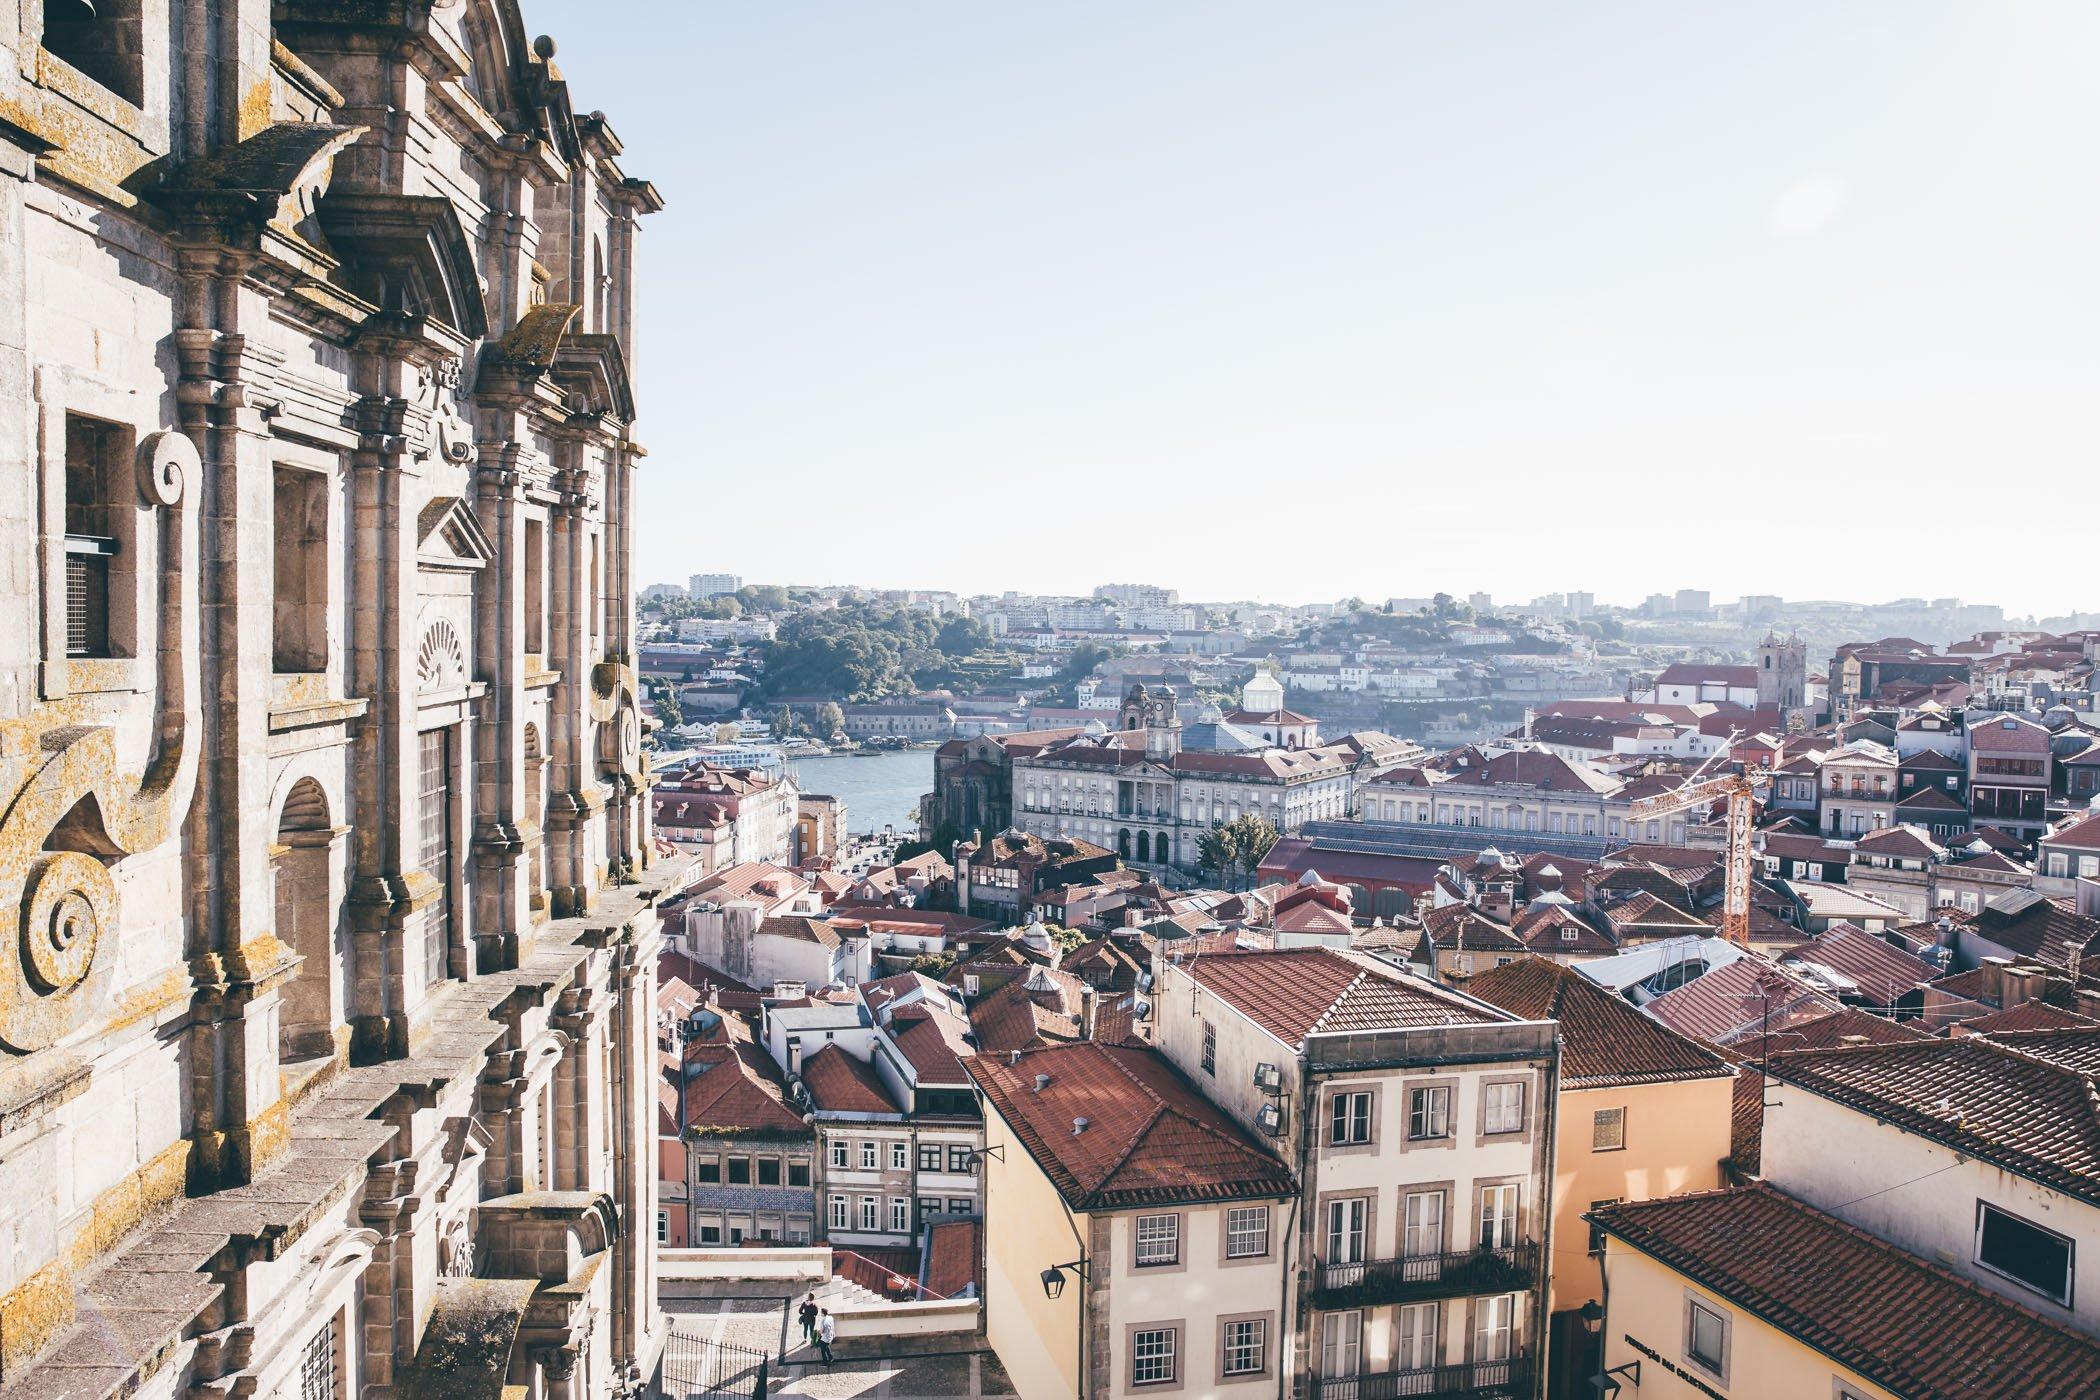 Miradouro da Rua das Aldas Porto